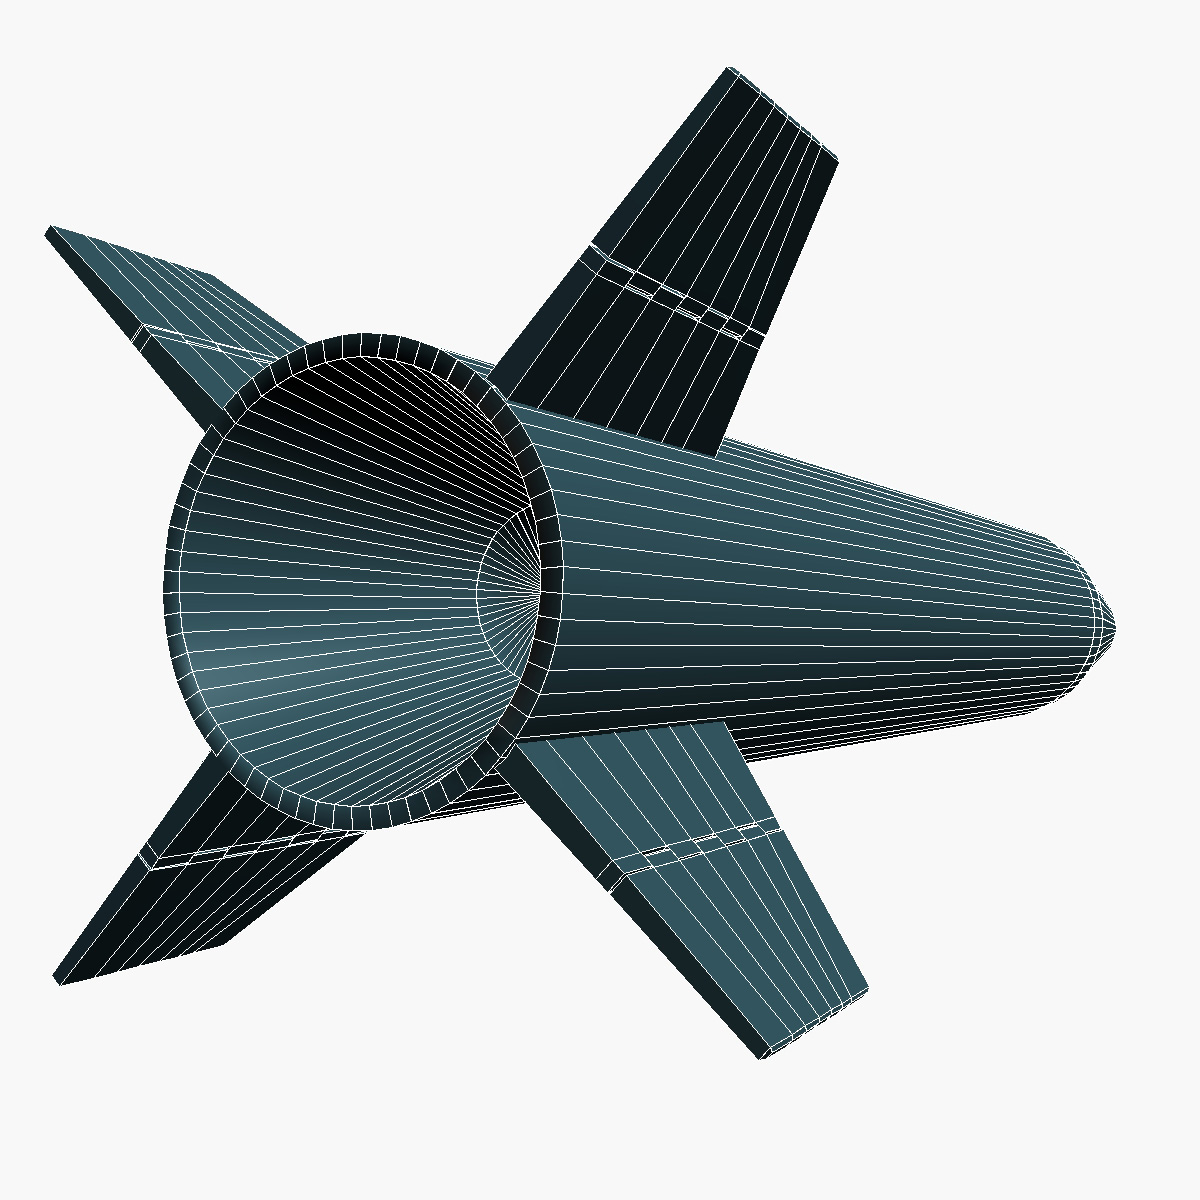 lora missile 3d model 3ds dxf fbx blend cob dae x obj 217683